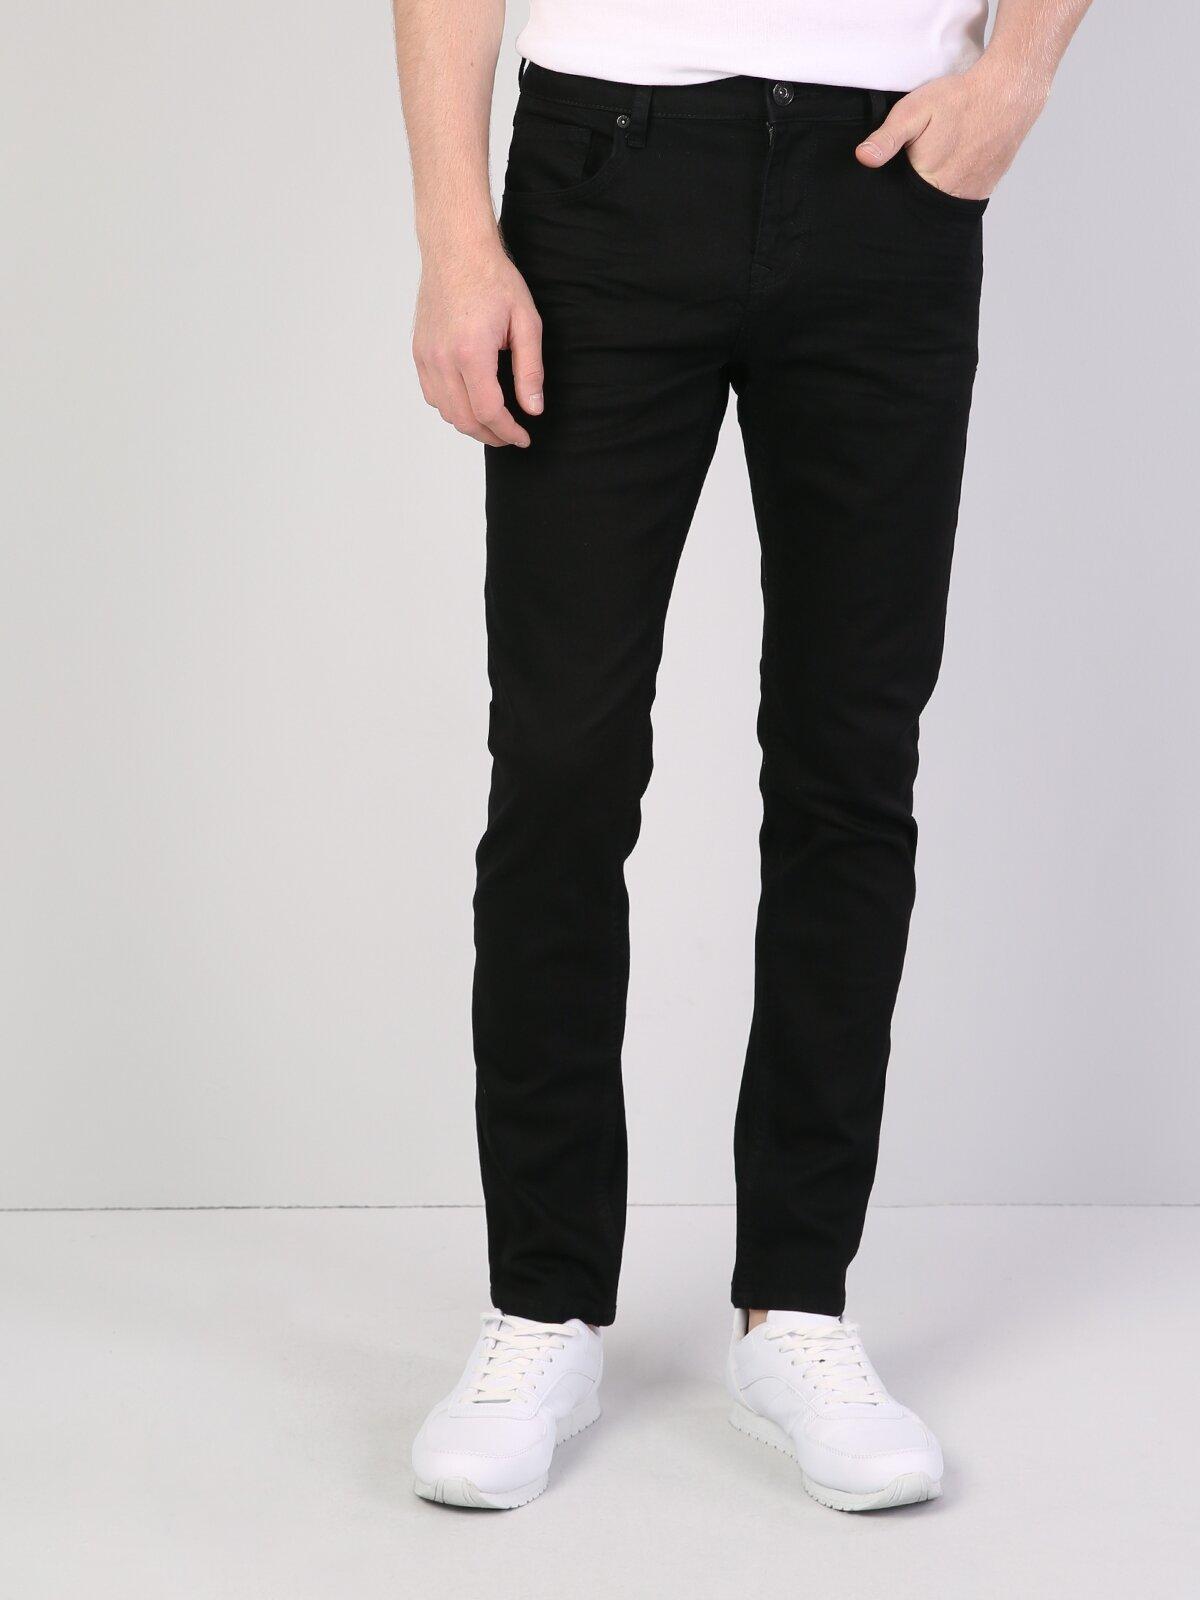 044 Karl Straight Fit Düşük Bel Düz Paça  Erkek Siyah Jean Pantolon